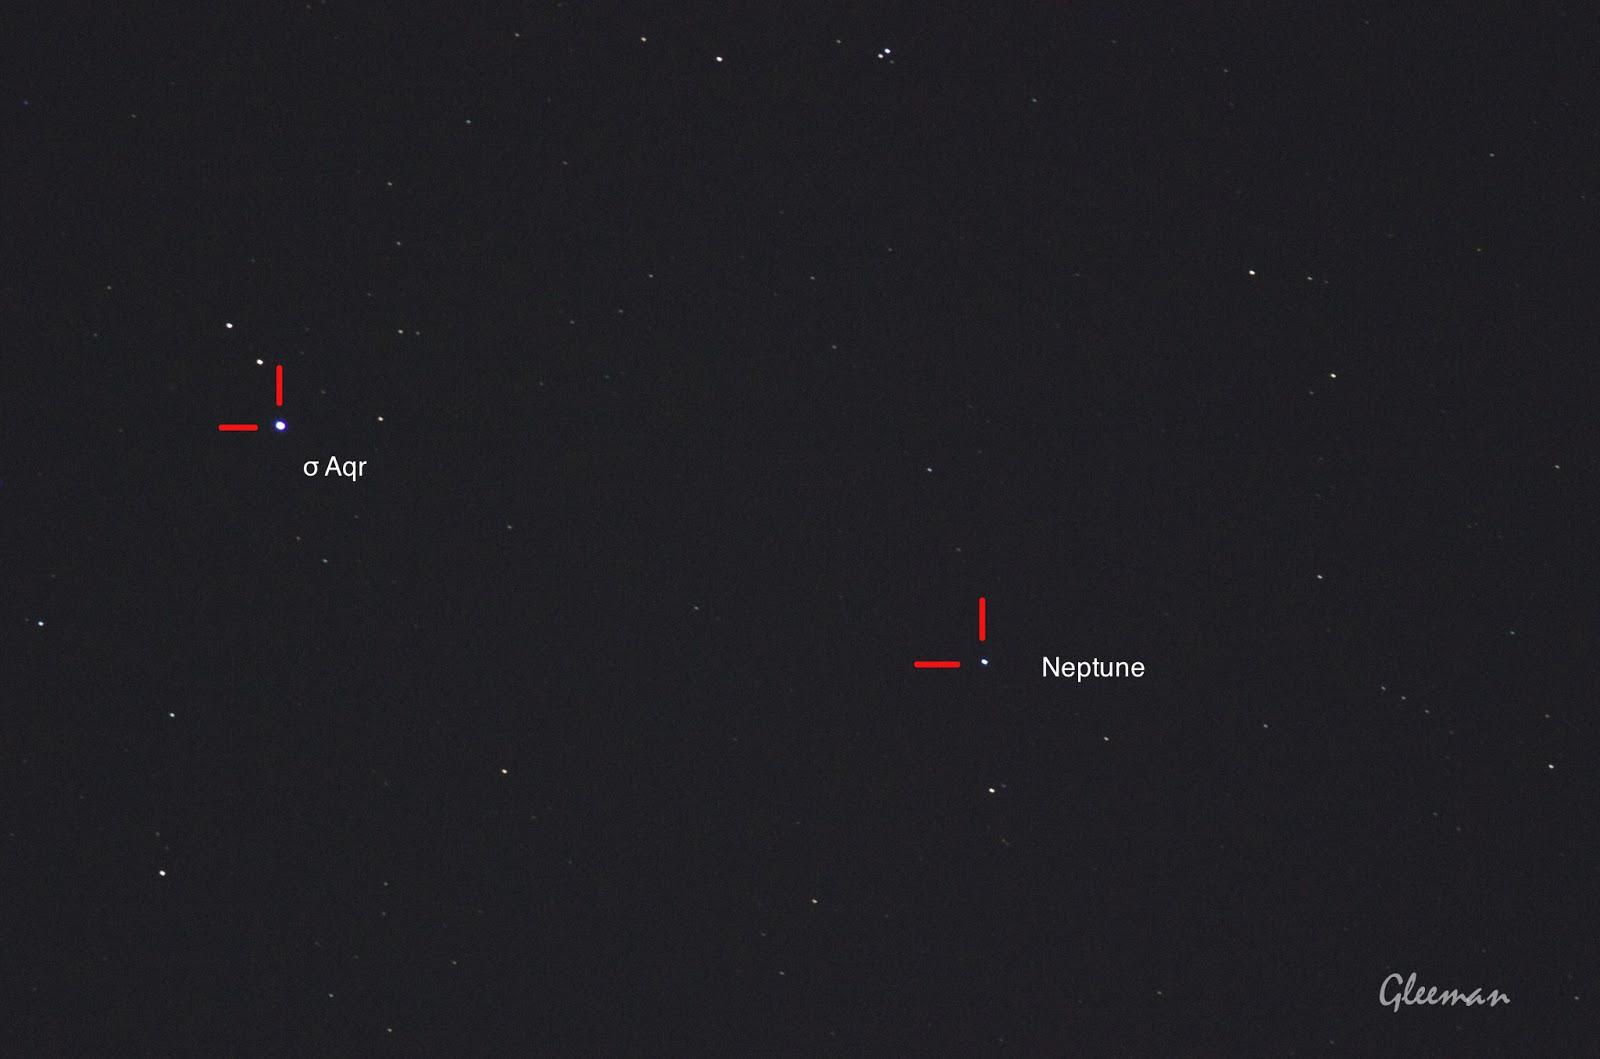 Neptune 海王星目前在寶瓶座/ Pentax Pentax 75SDHF + 1.4XL + K5 ,O-GPS1 Astrotracer